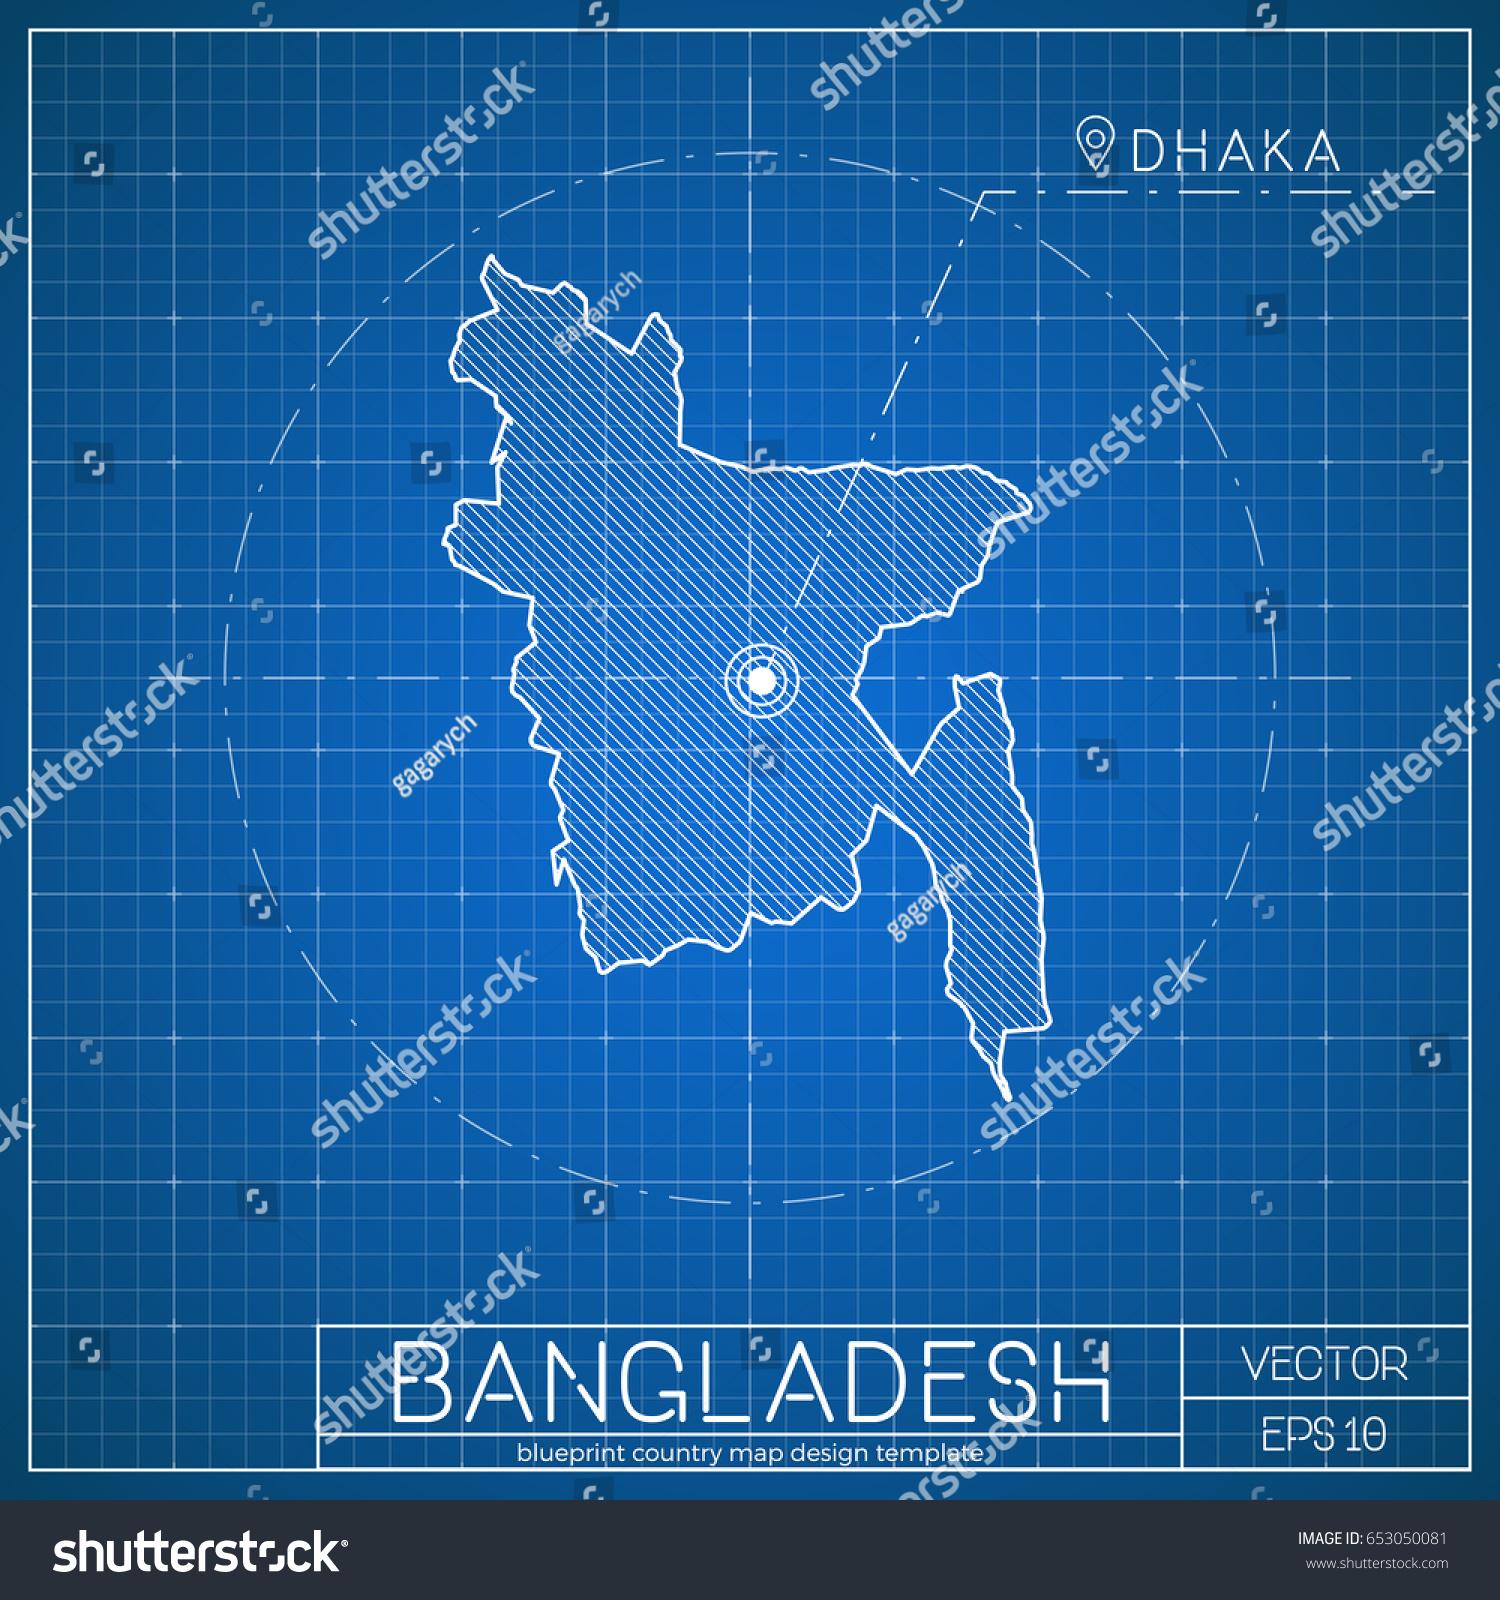 Bangladesh blueprint map template capital city stock vector royalty bangladesh blueprint map template with capital city dhaka marked on blueprint bangladeshi map vector malvernweather Images